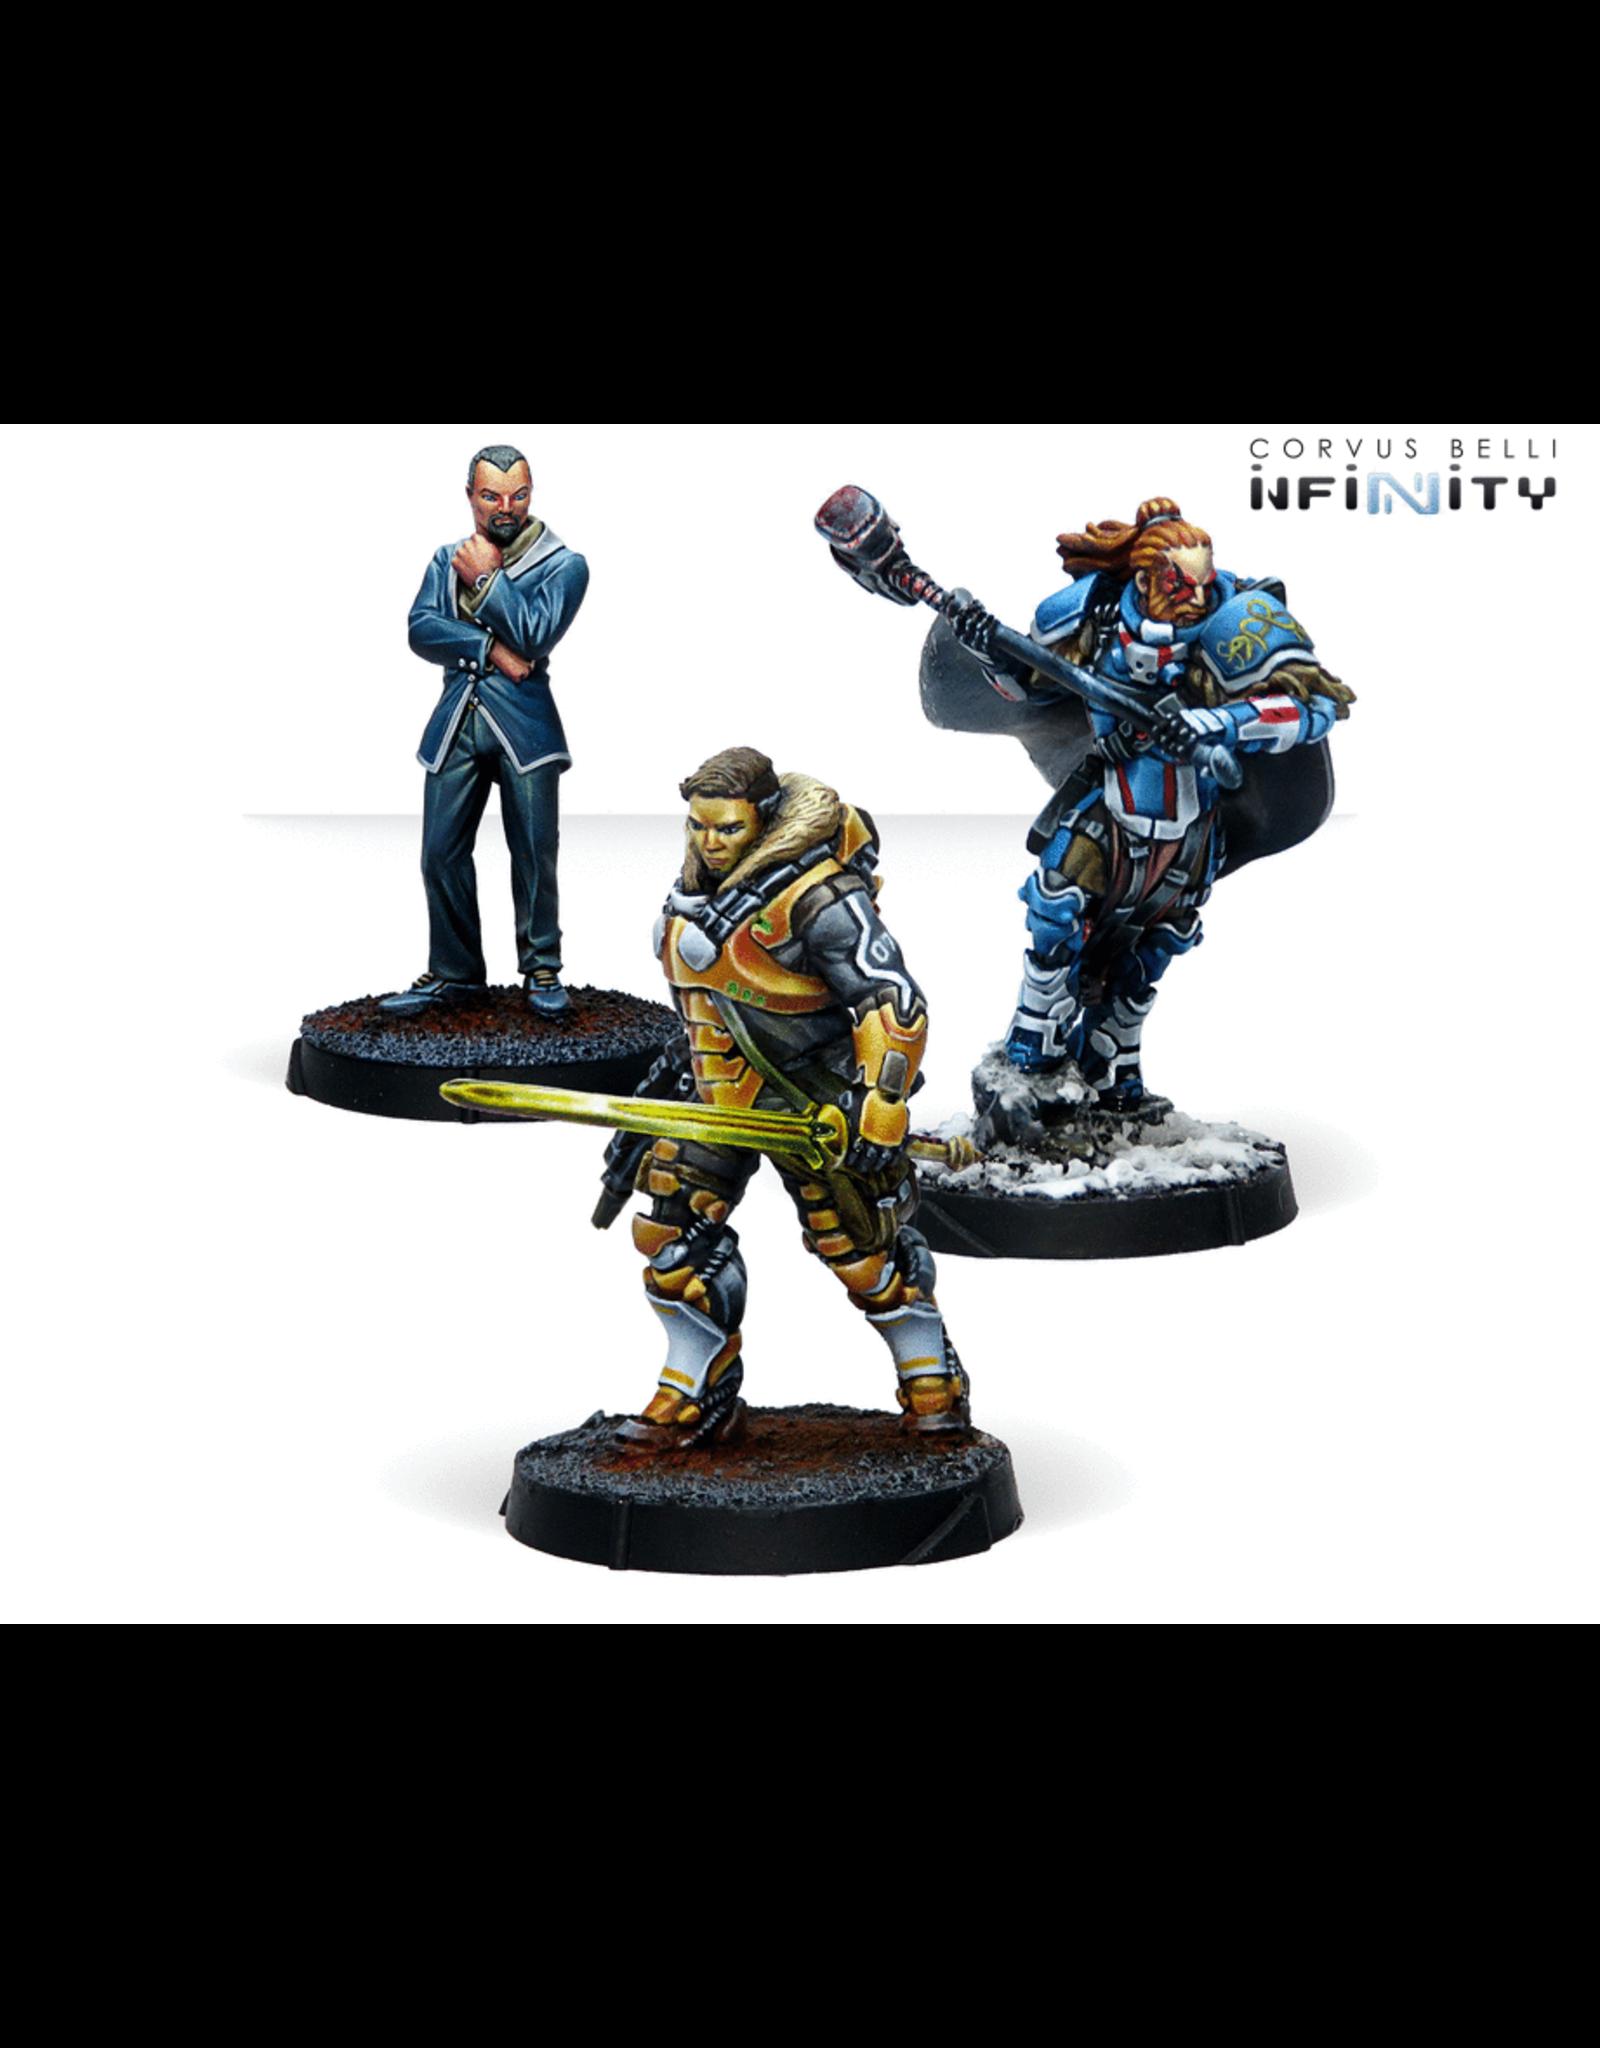 Corvus Belli Infinity: Dire Foes Alpha: Retaliation